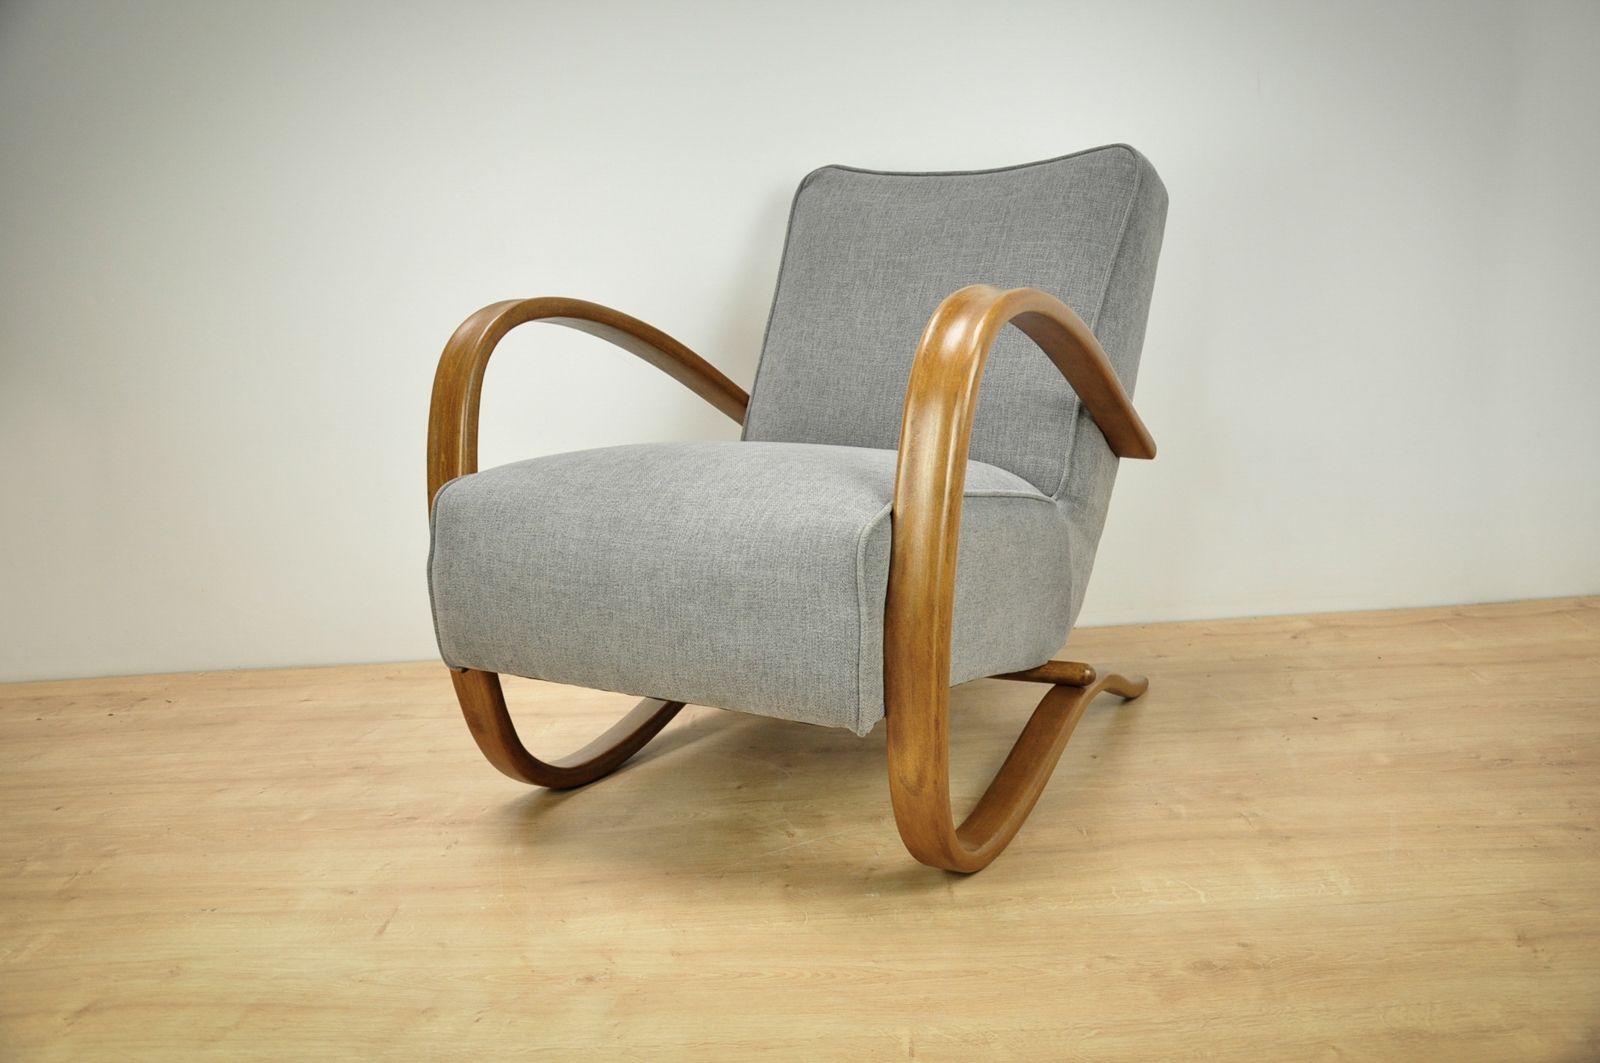 set-of-2-vintage-armchairs-h-269-by-jindřich-halabala-for-up-závody6